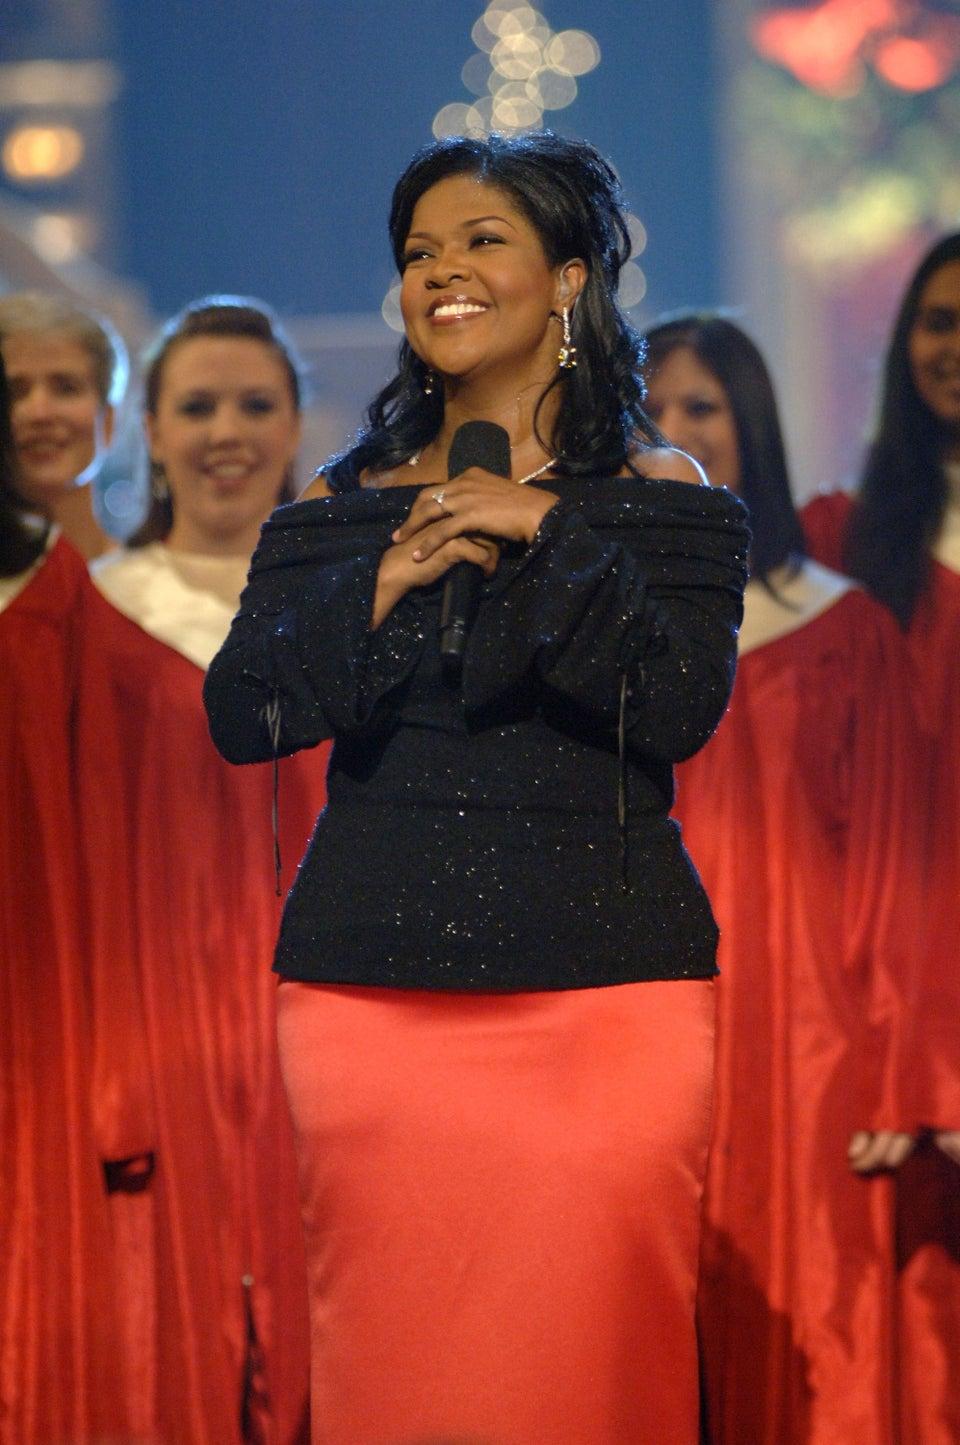 10 Holiday Gospel Songs for the Season